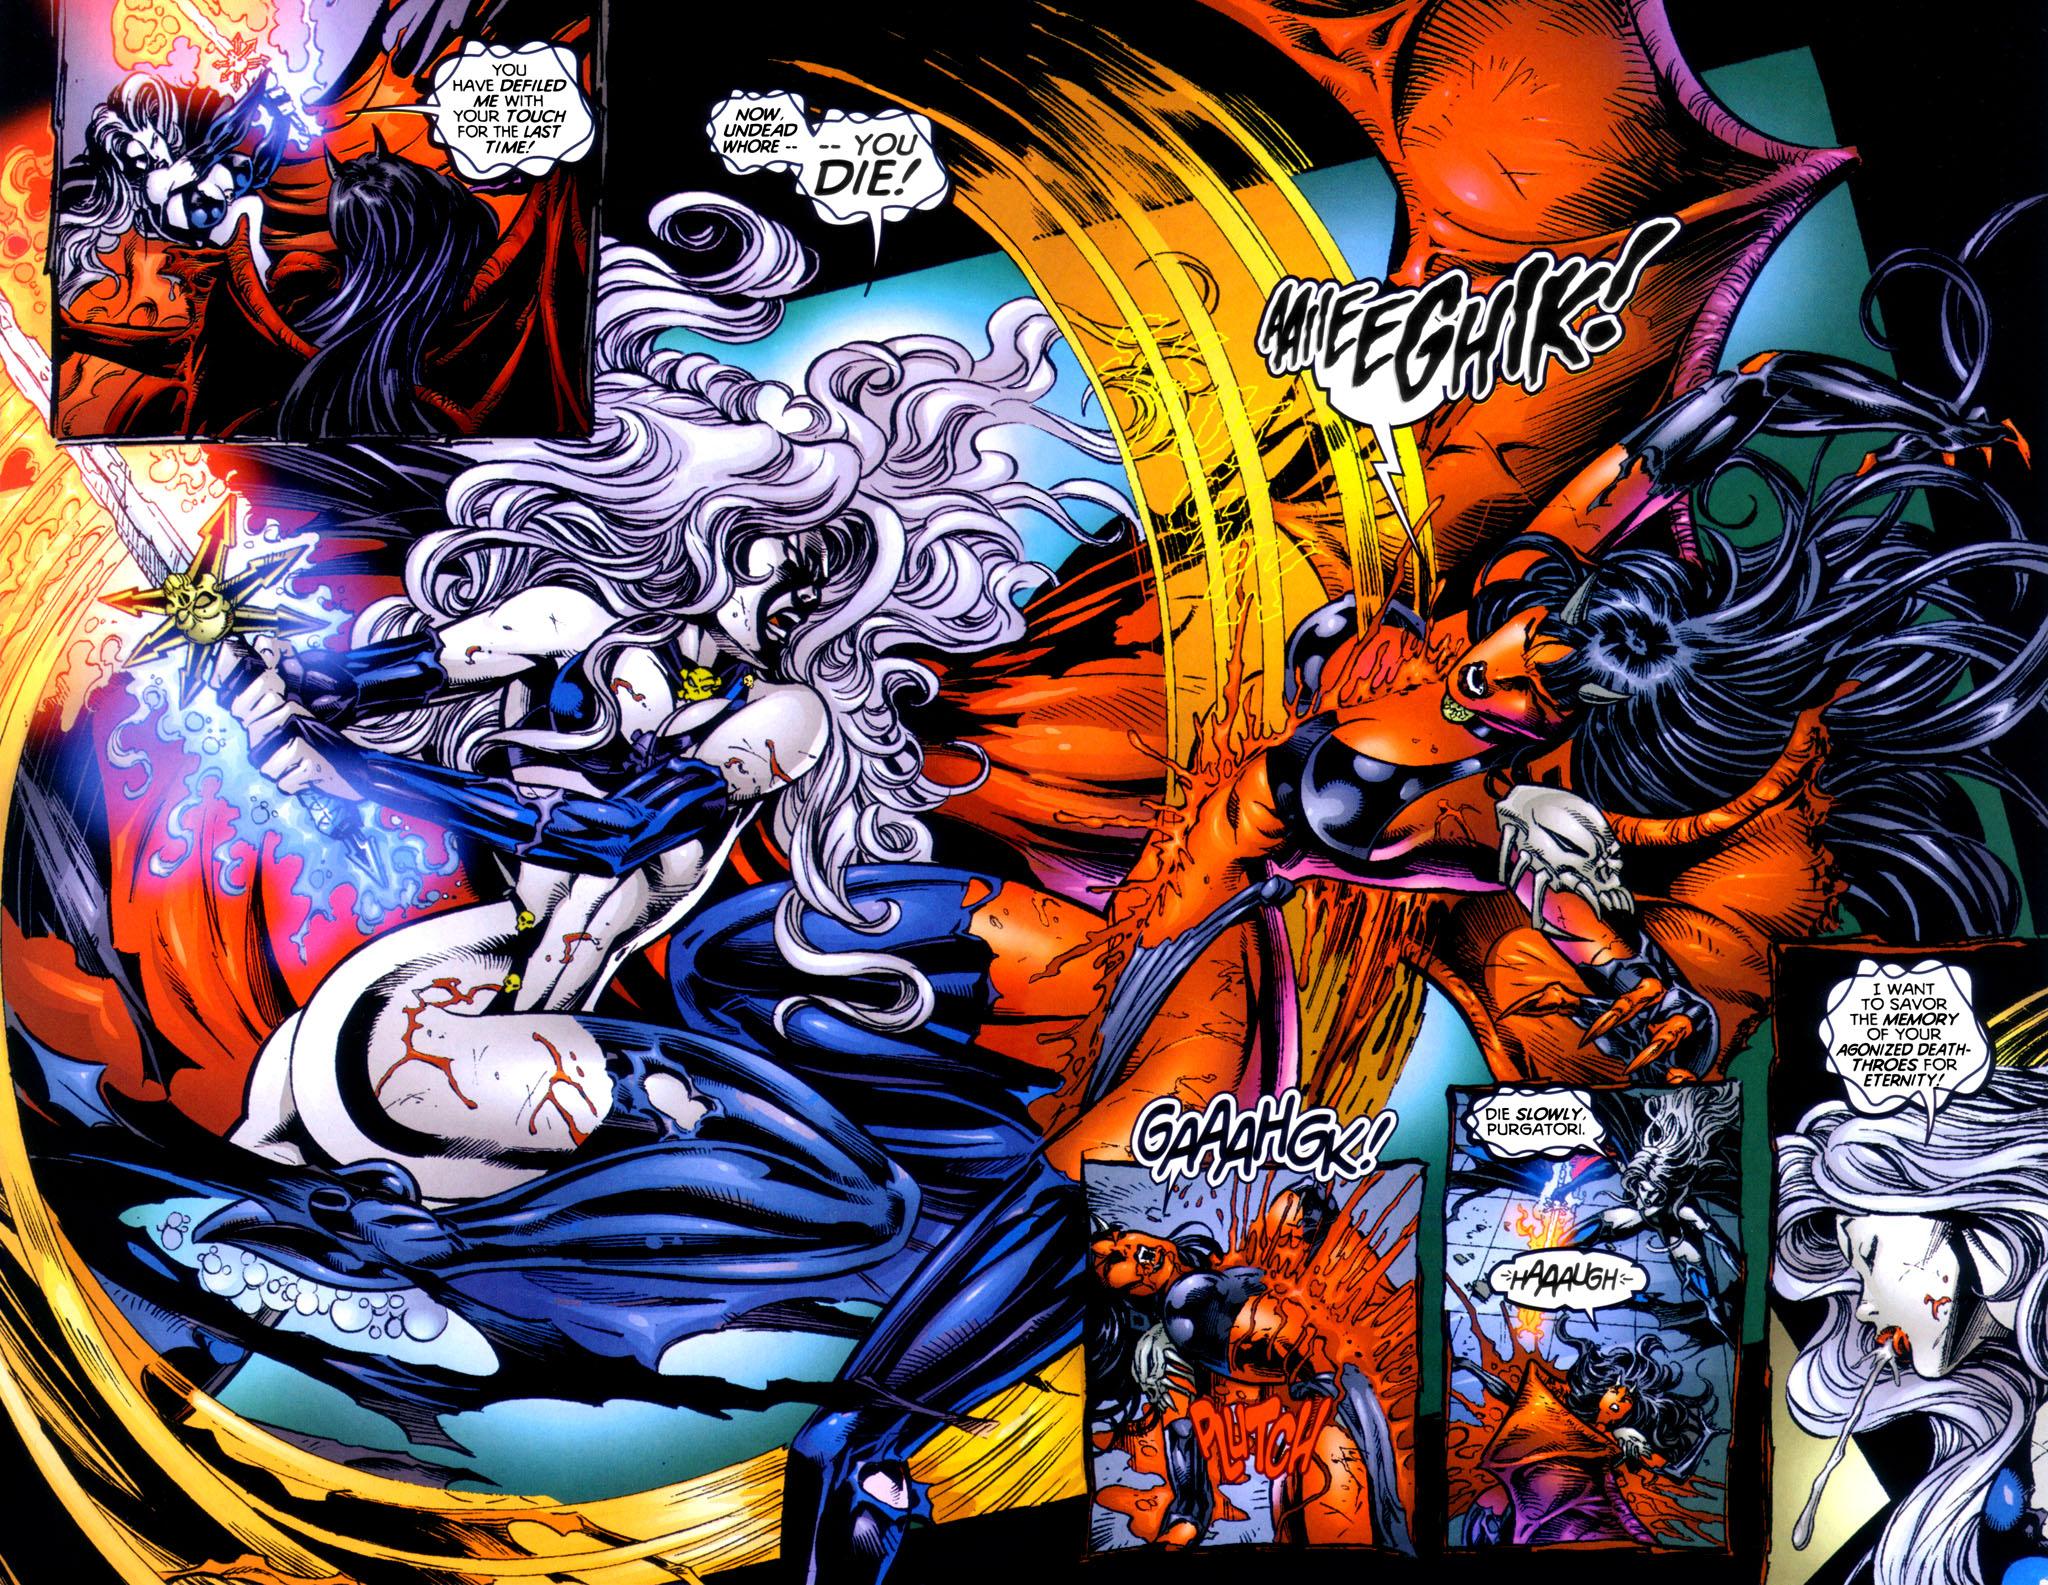 Read online Lady Death vs. Purgatori comic -  Issue # Full - 14